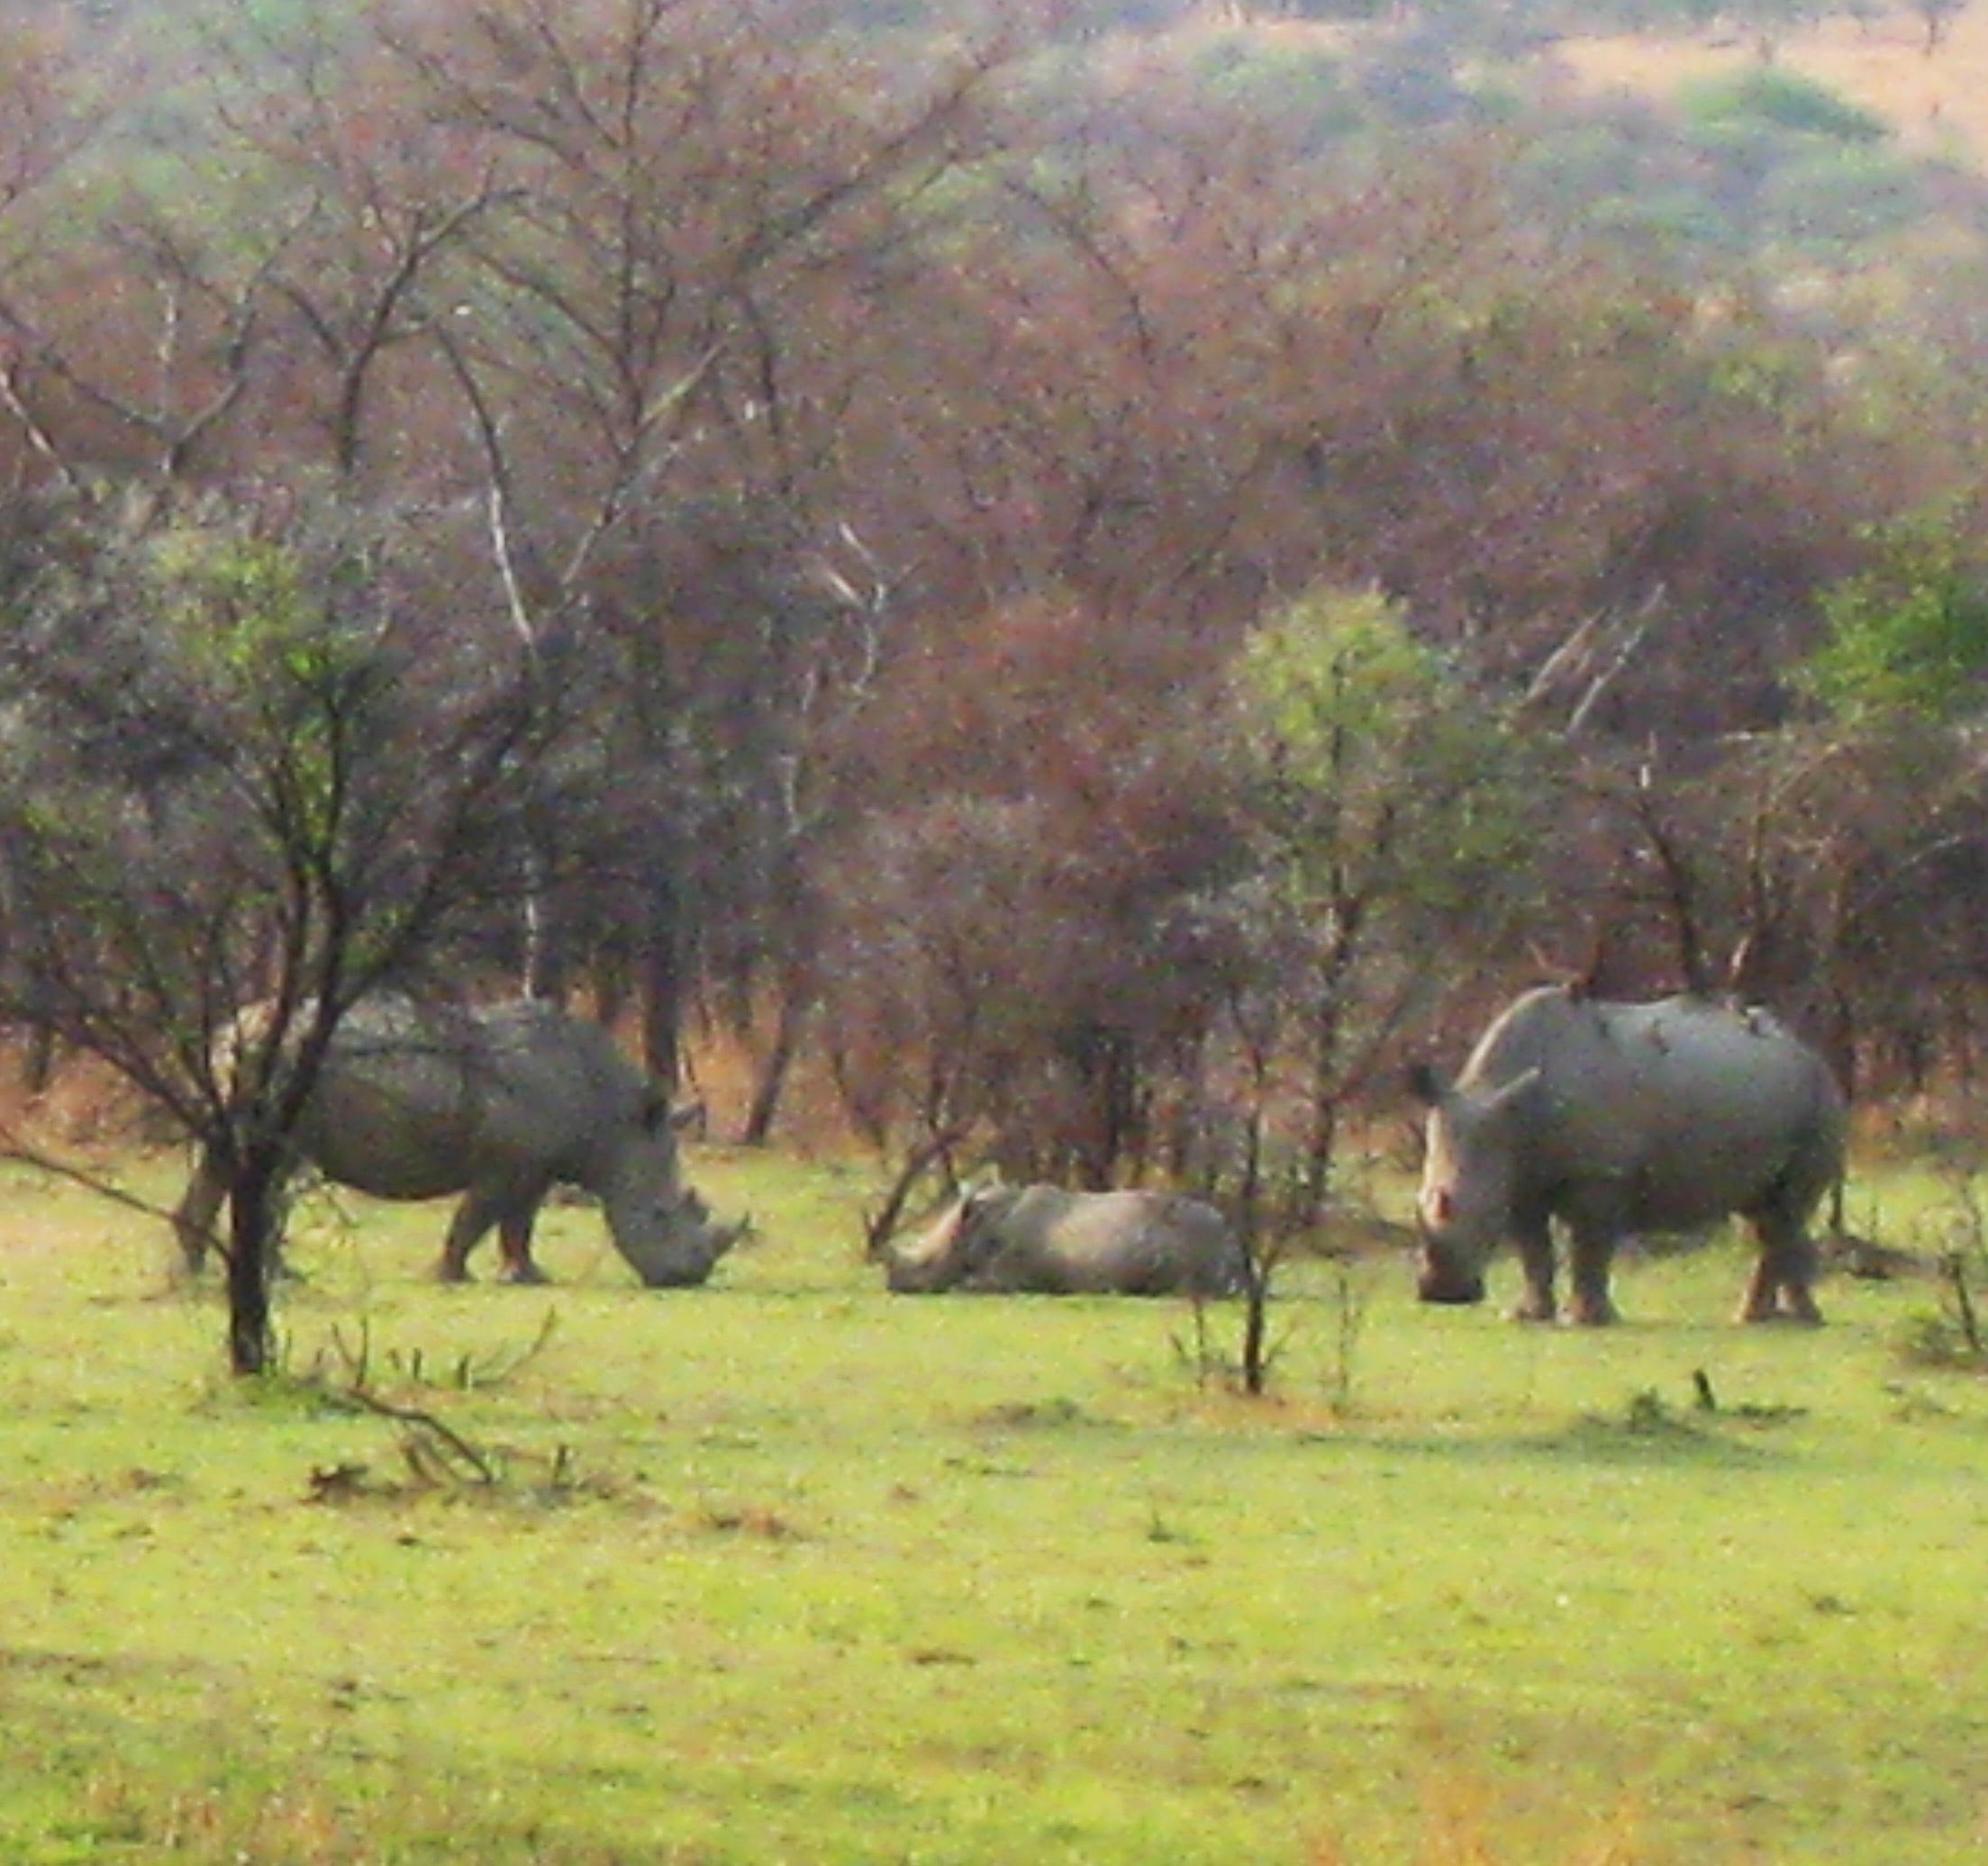 Borakalalo Rhinos